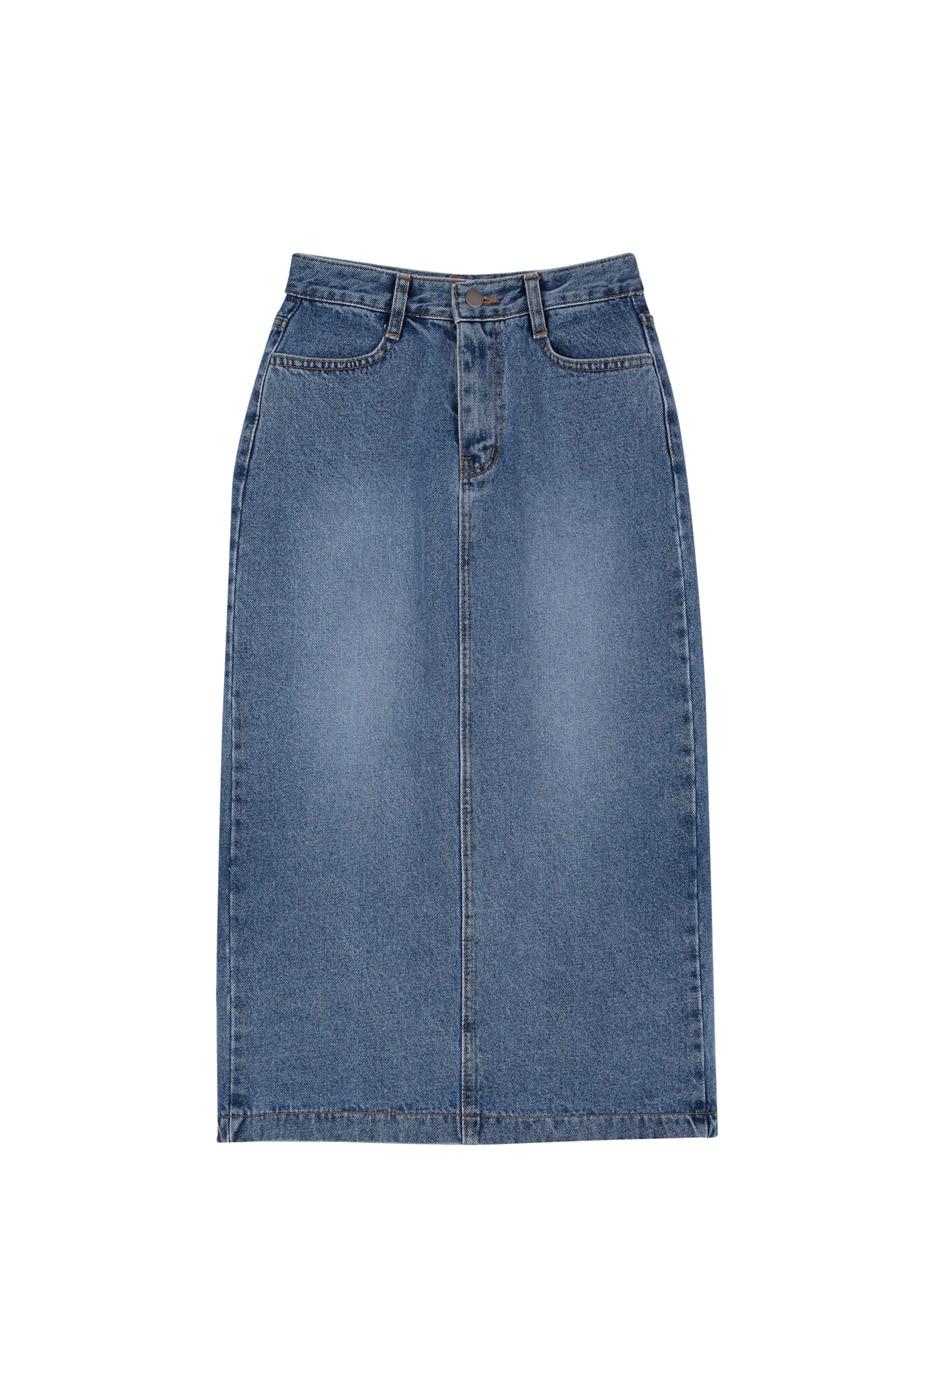 Daily denim maxi skirt